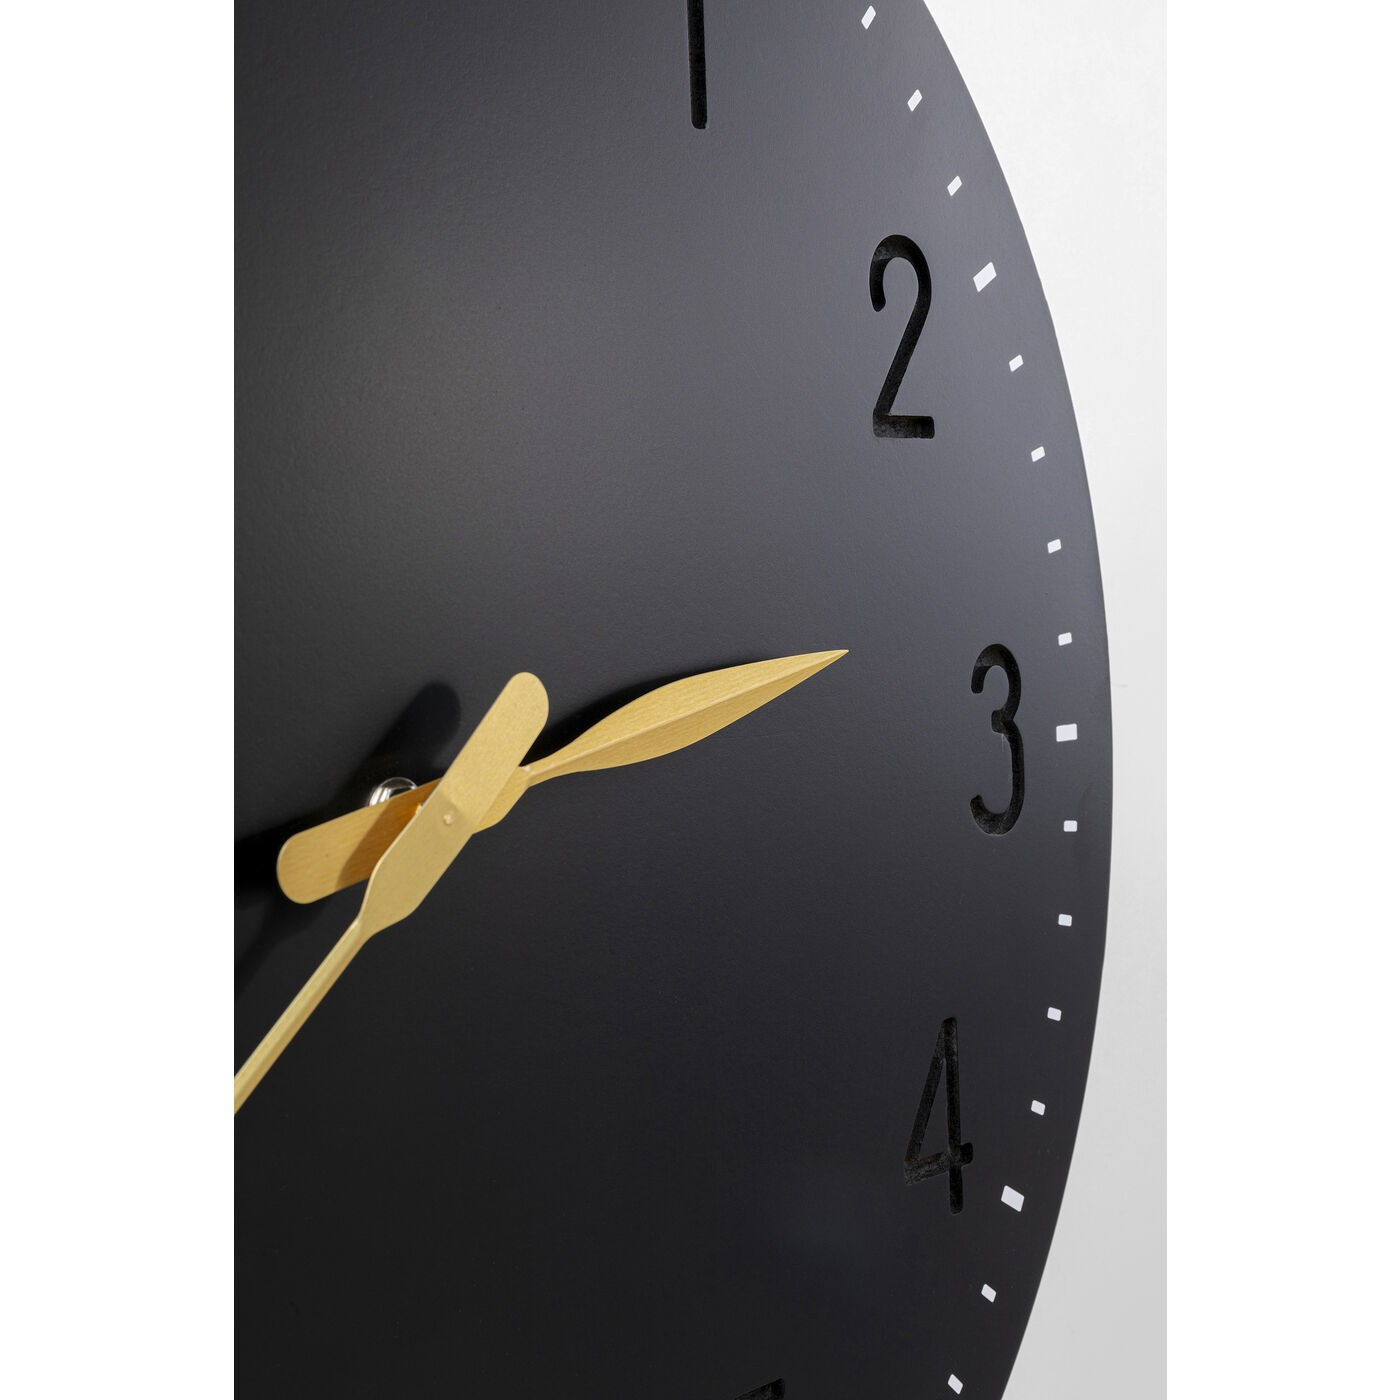 Horloge murale Mailo 50cm noire Kare Design